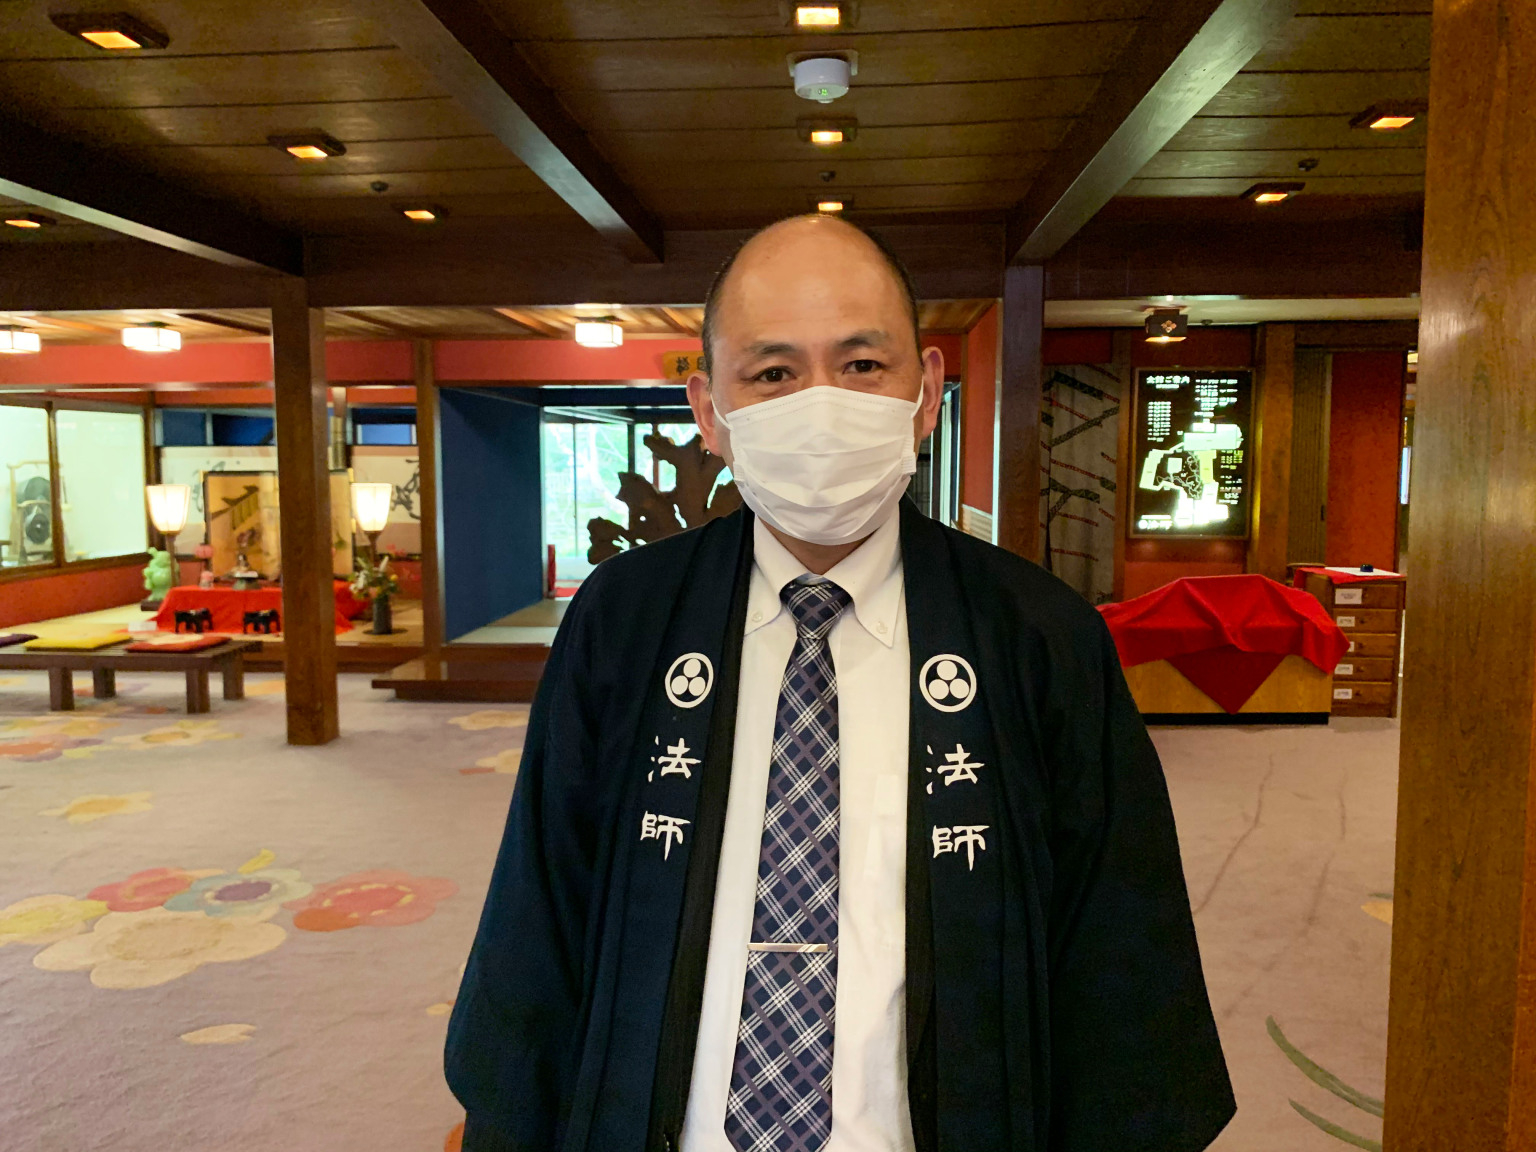 Houshi-Ryokan-onsen-hotel-oldest-in-world-Japan-business-travel-Hoshi-accommodation-stay-photos-reviews-Ishikawa-16.jpg